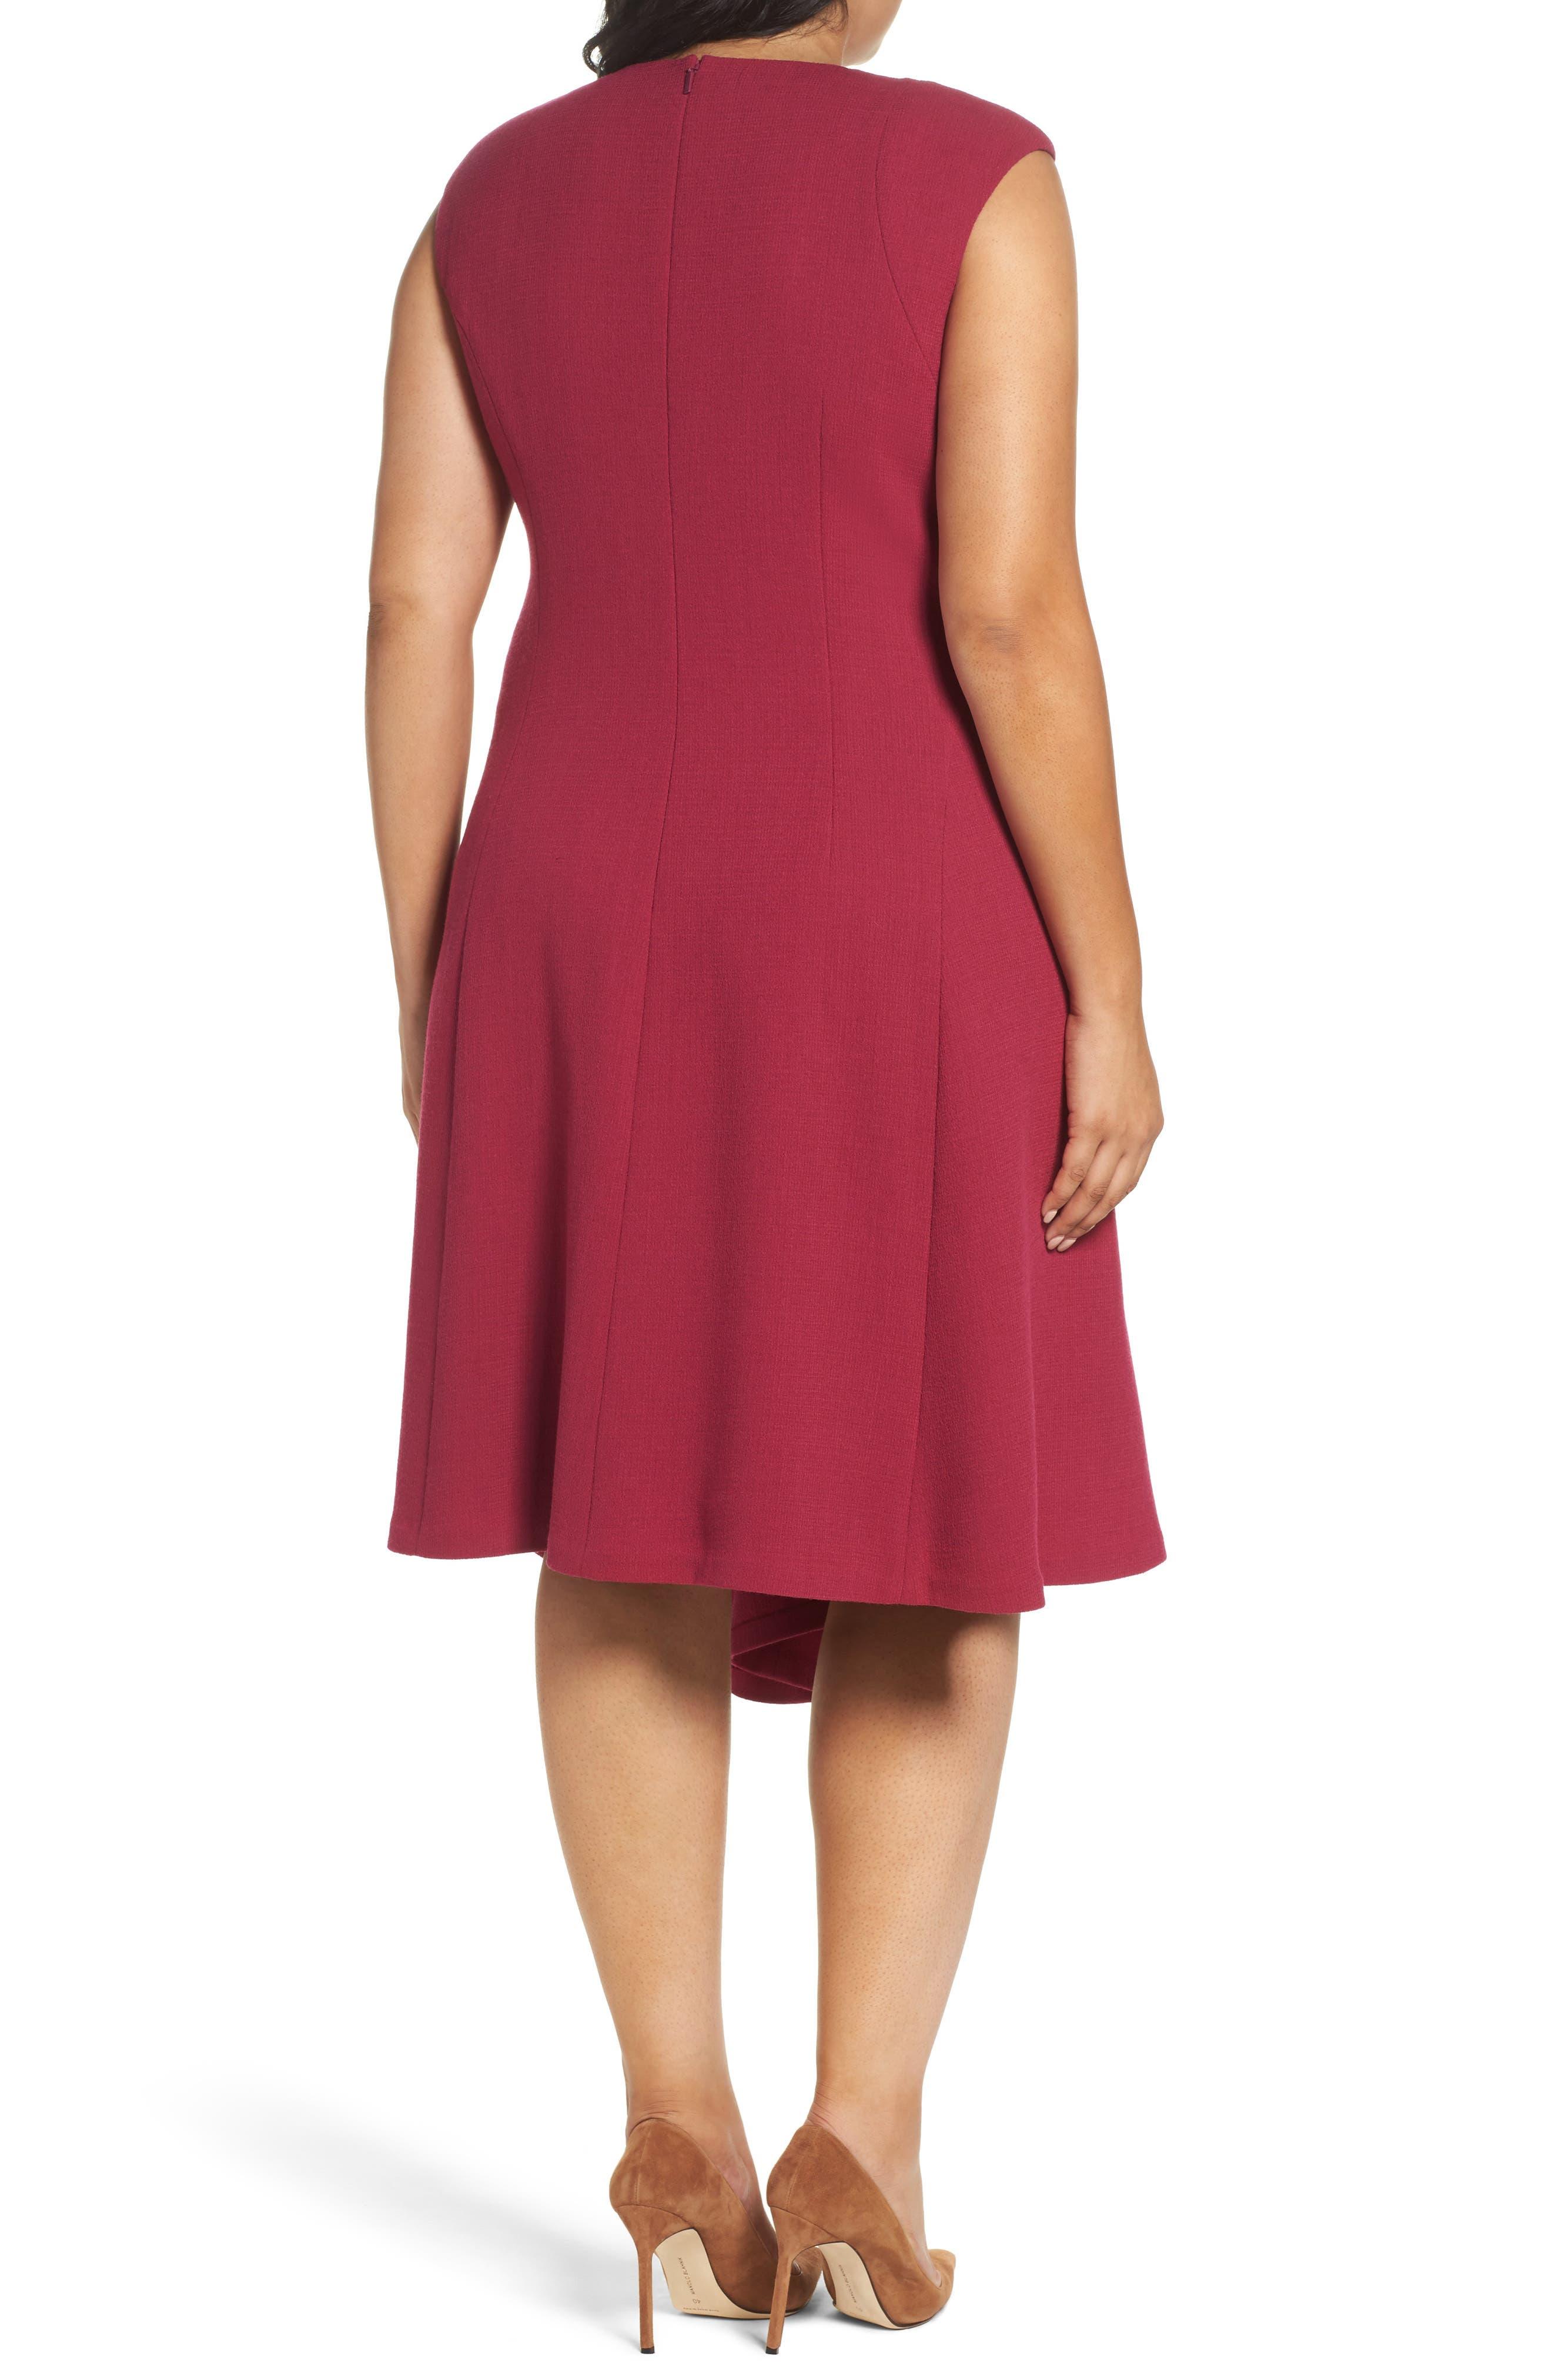 Aveena Wool Interlock Dress,                             Alternate thumbnail 2, color,                             651